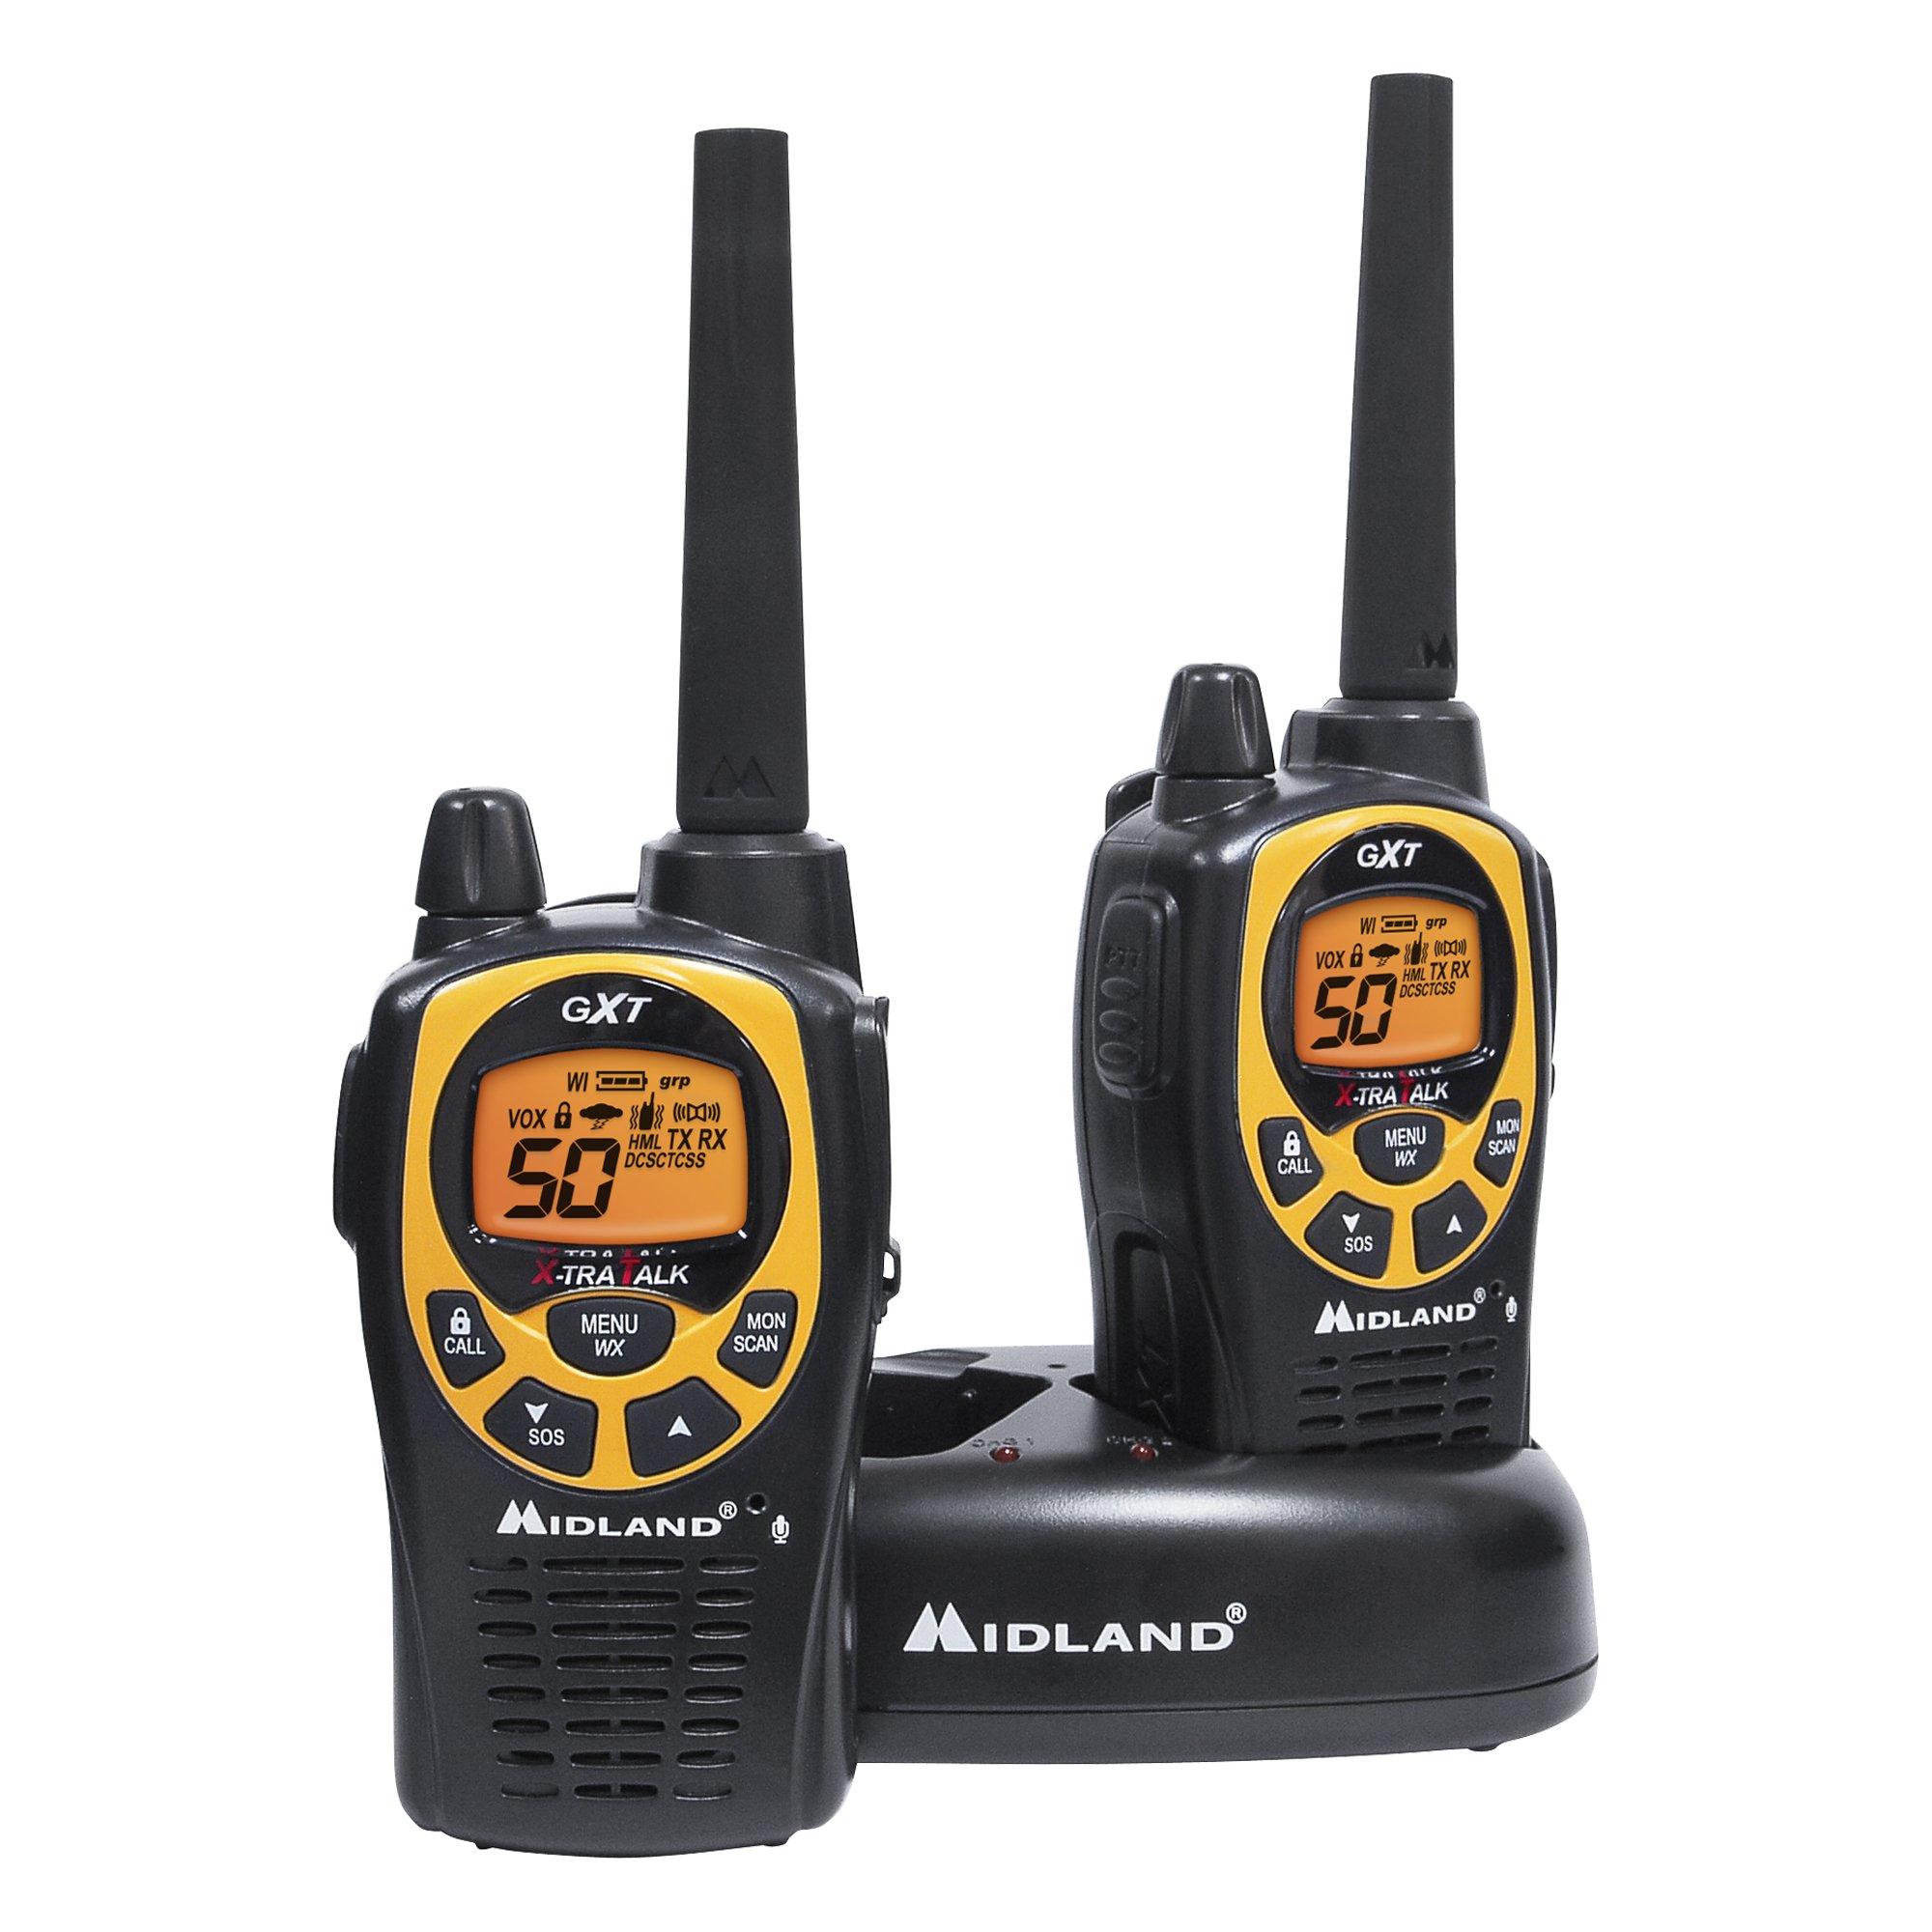 Midland - GXT1030VP4, 50 Channel GMRS Two-Way Radio - Up to 36 Mile Range Walkie Talkie, 142 Privacy Codes, Waterproof, NOAA Weather Scan + Alert (Pair Pack) (Black/Yellow) by Midland (Image #2)